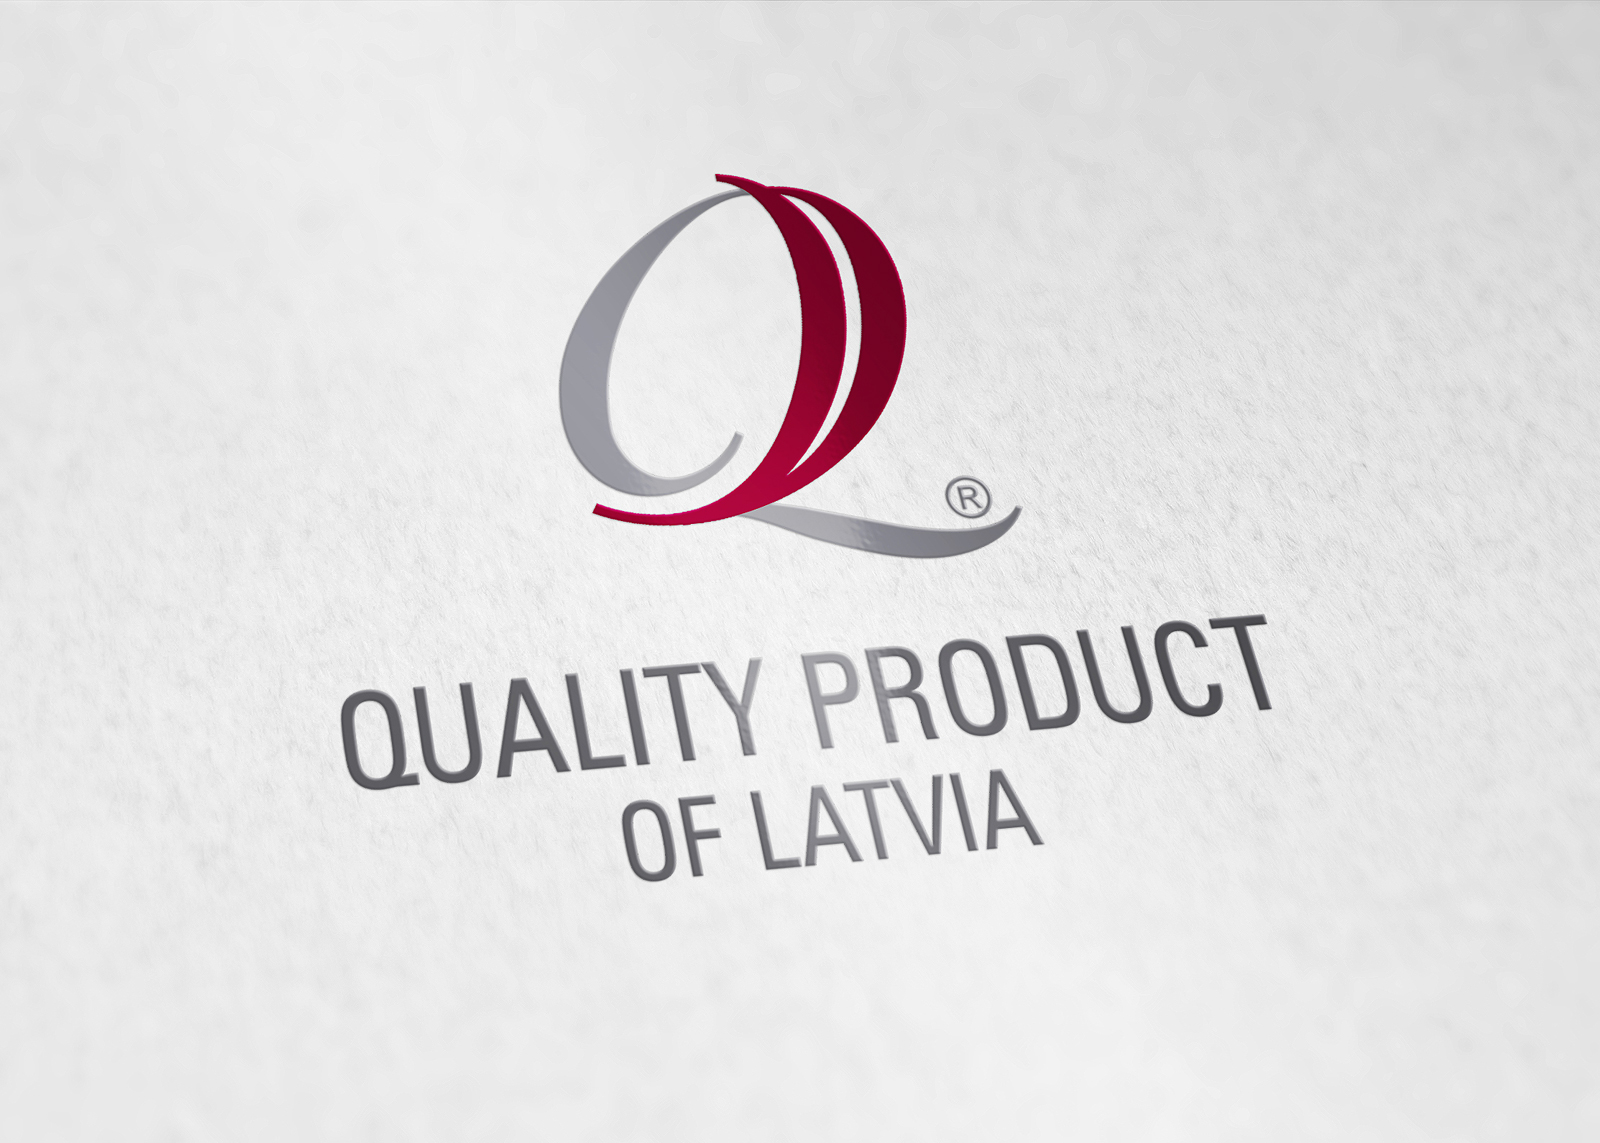 quality product of Latvia